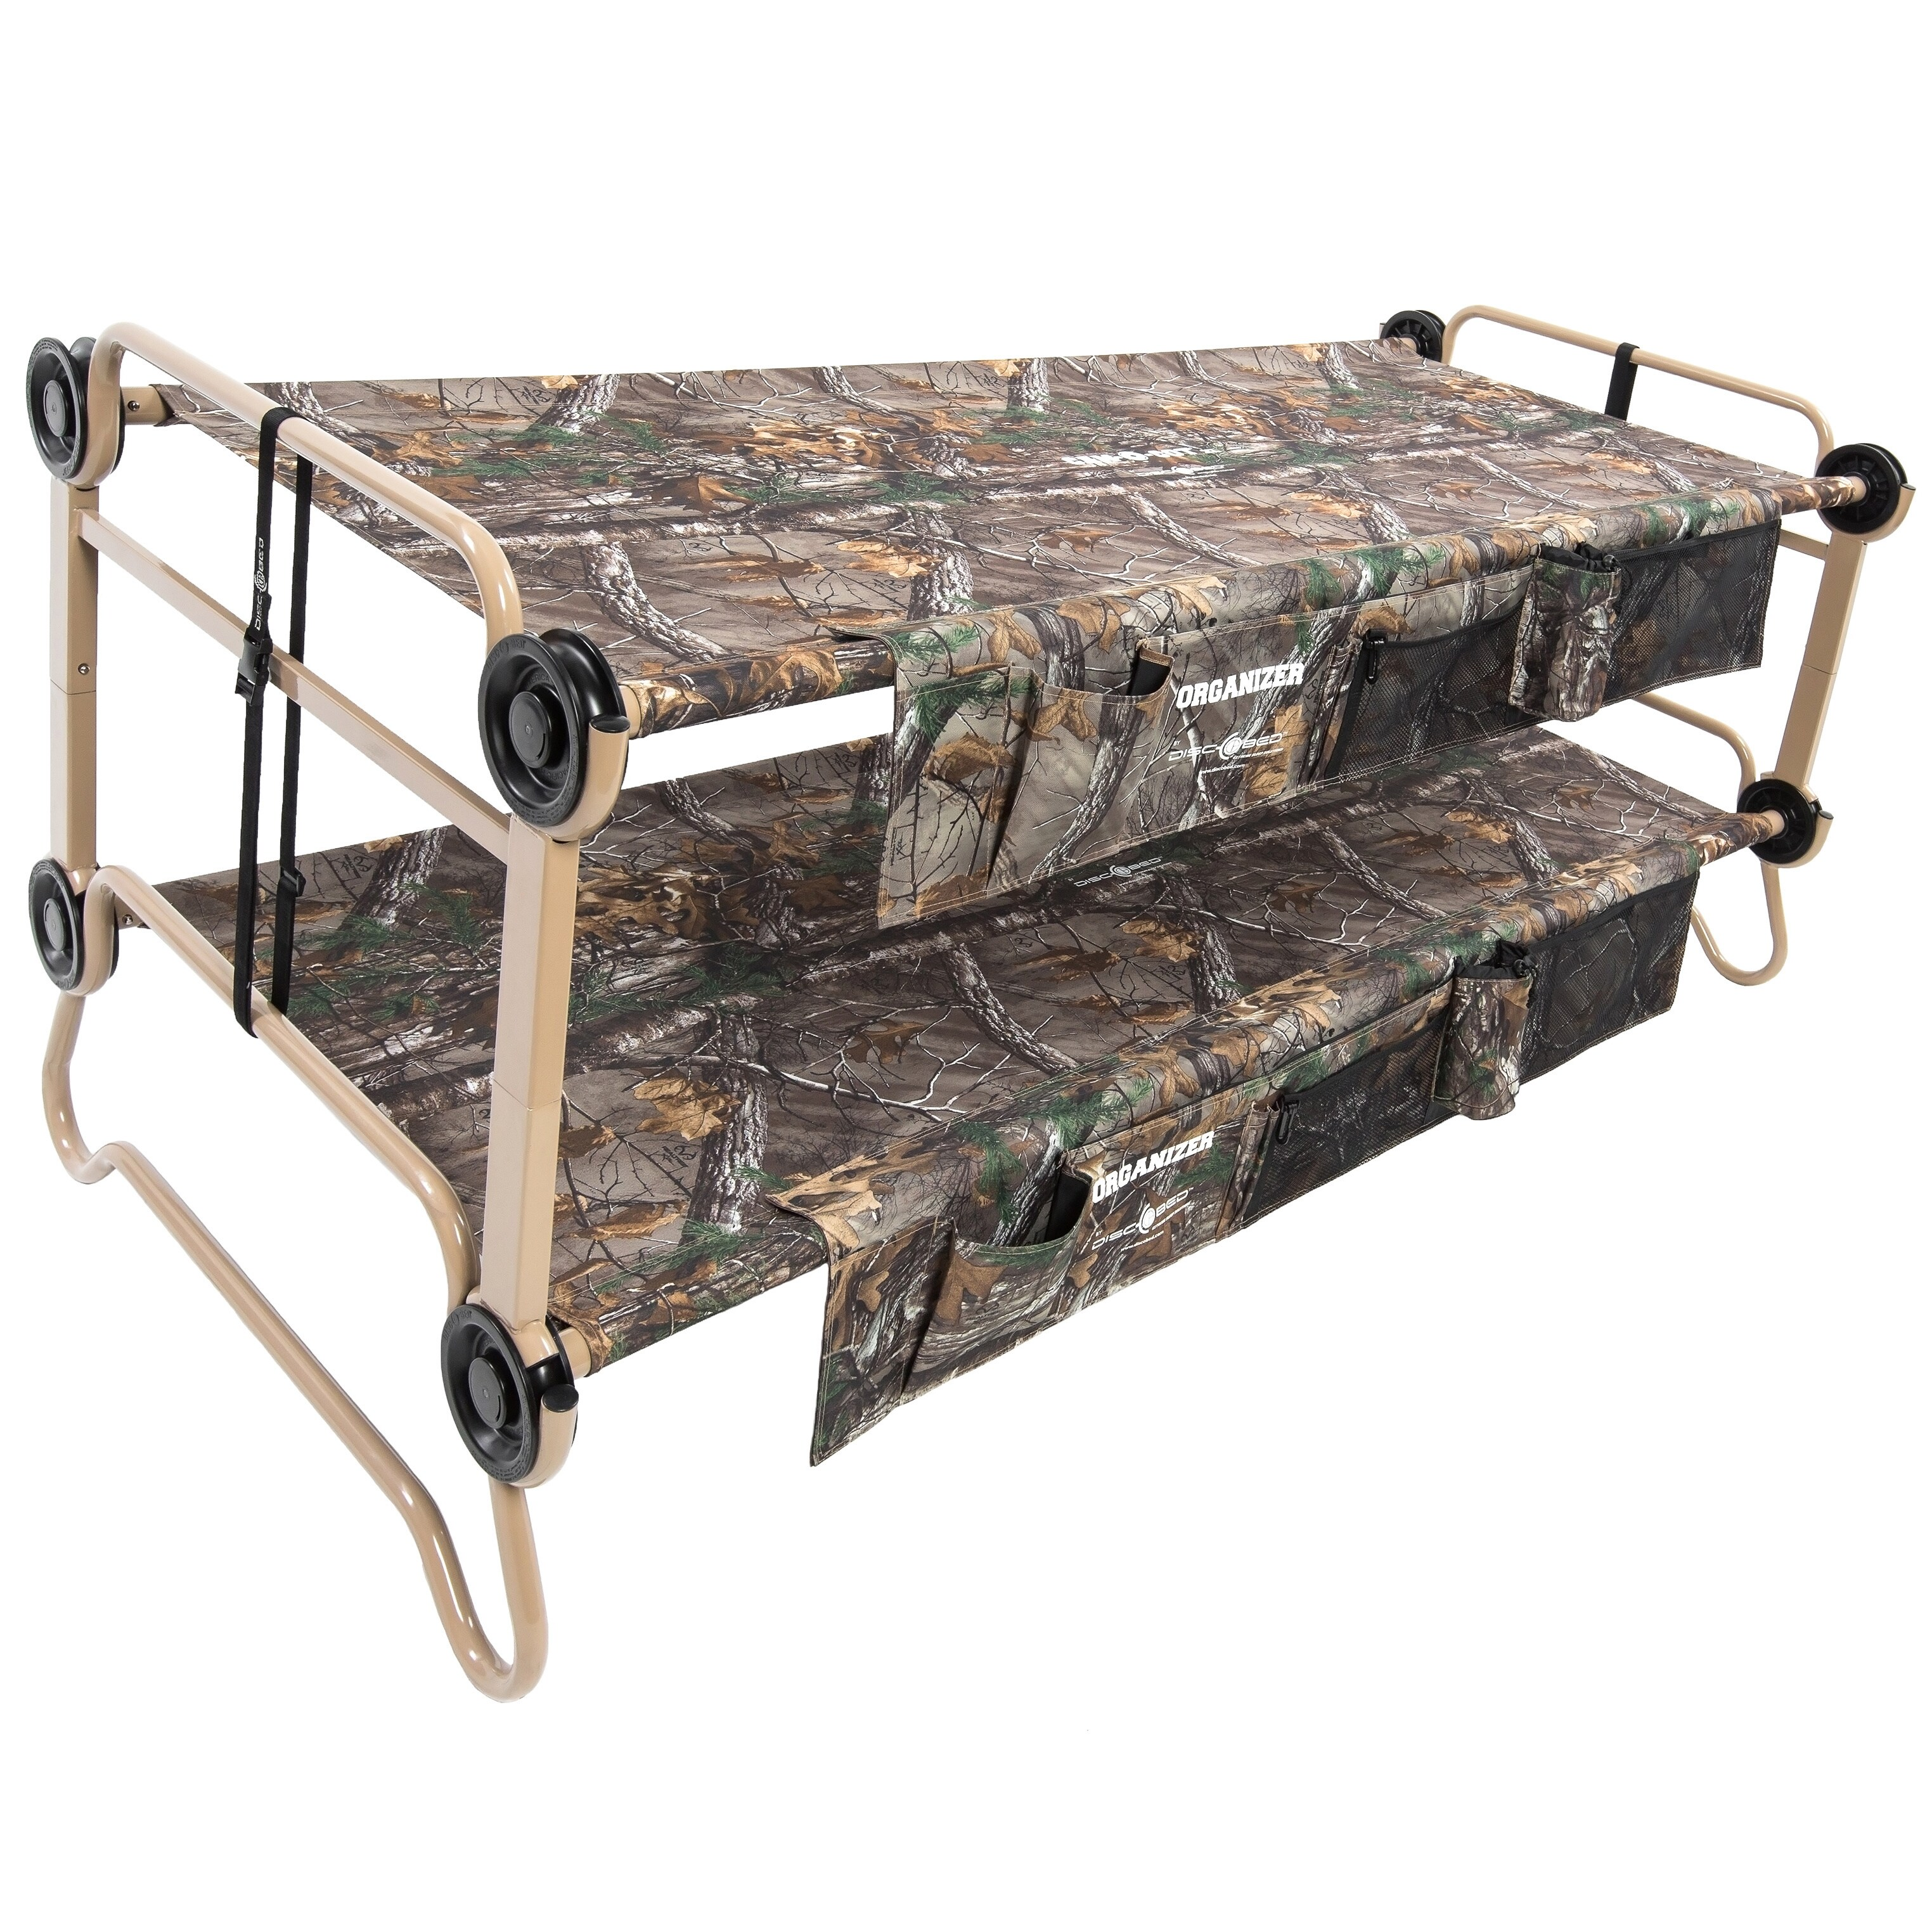 Cam-O-Bunk Realtree Xtra XL Portable Double Bunk Bed, Beige